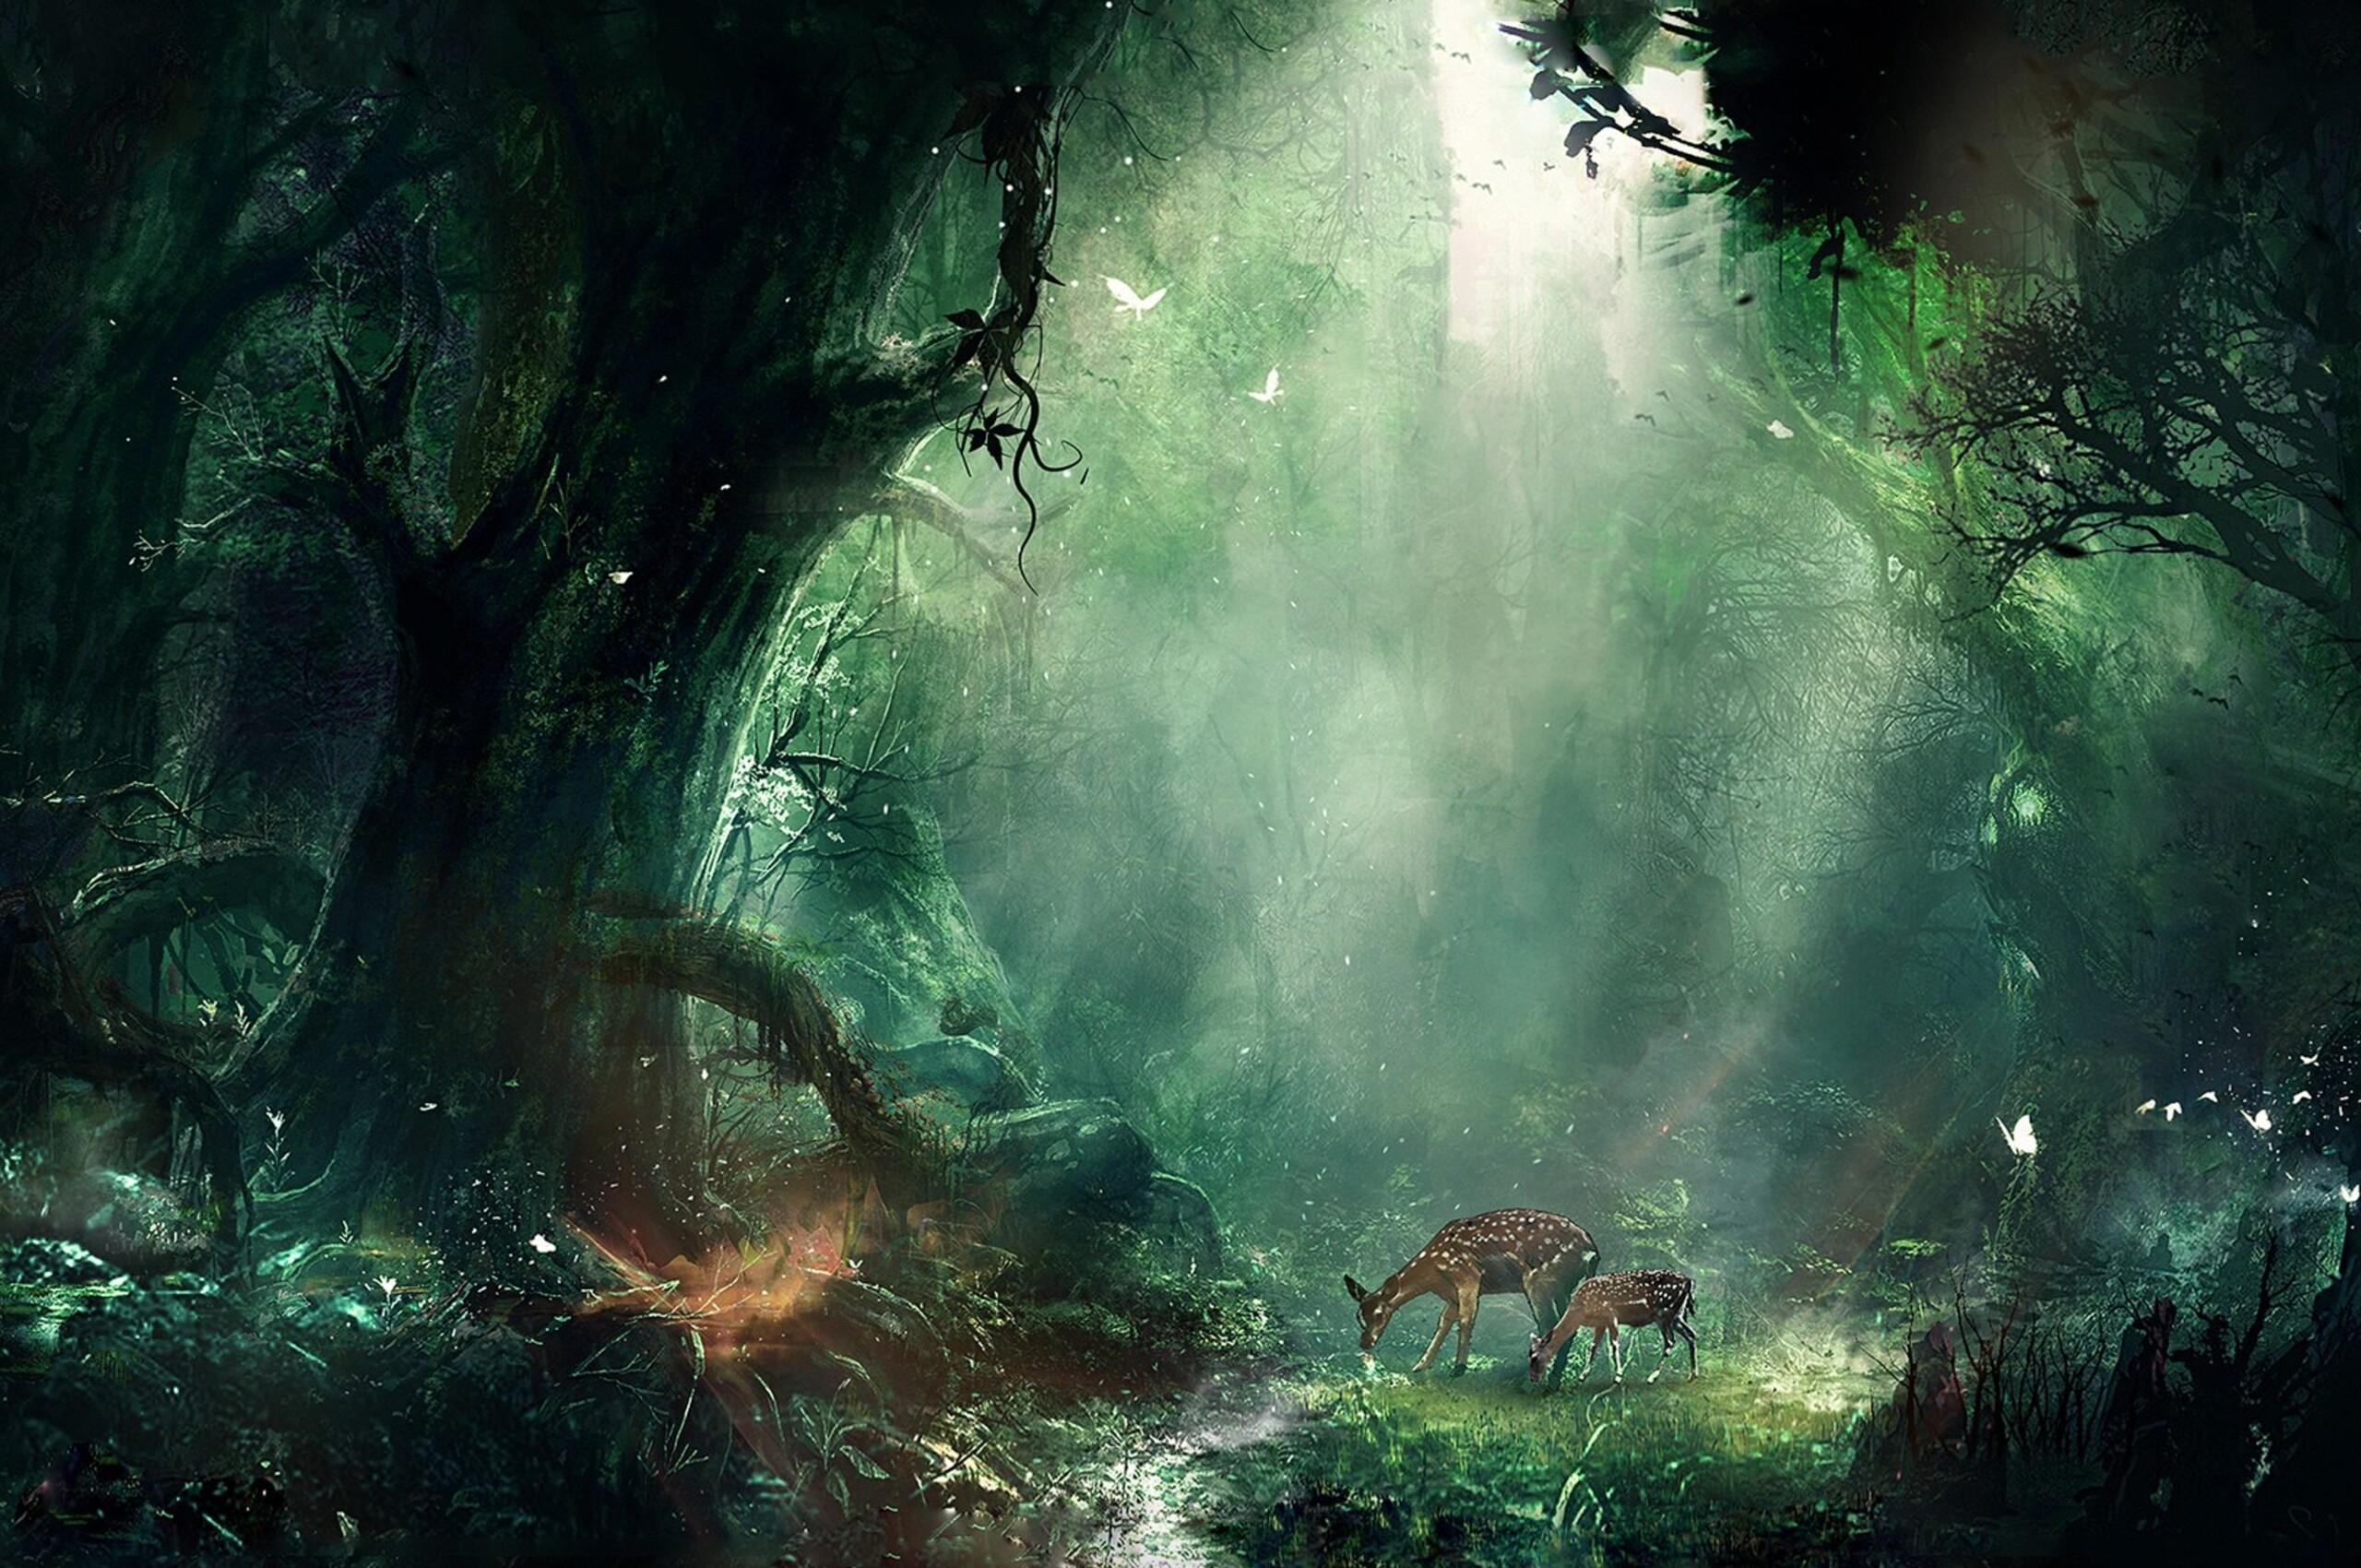 bambi-jungle.jpg